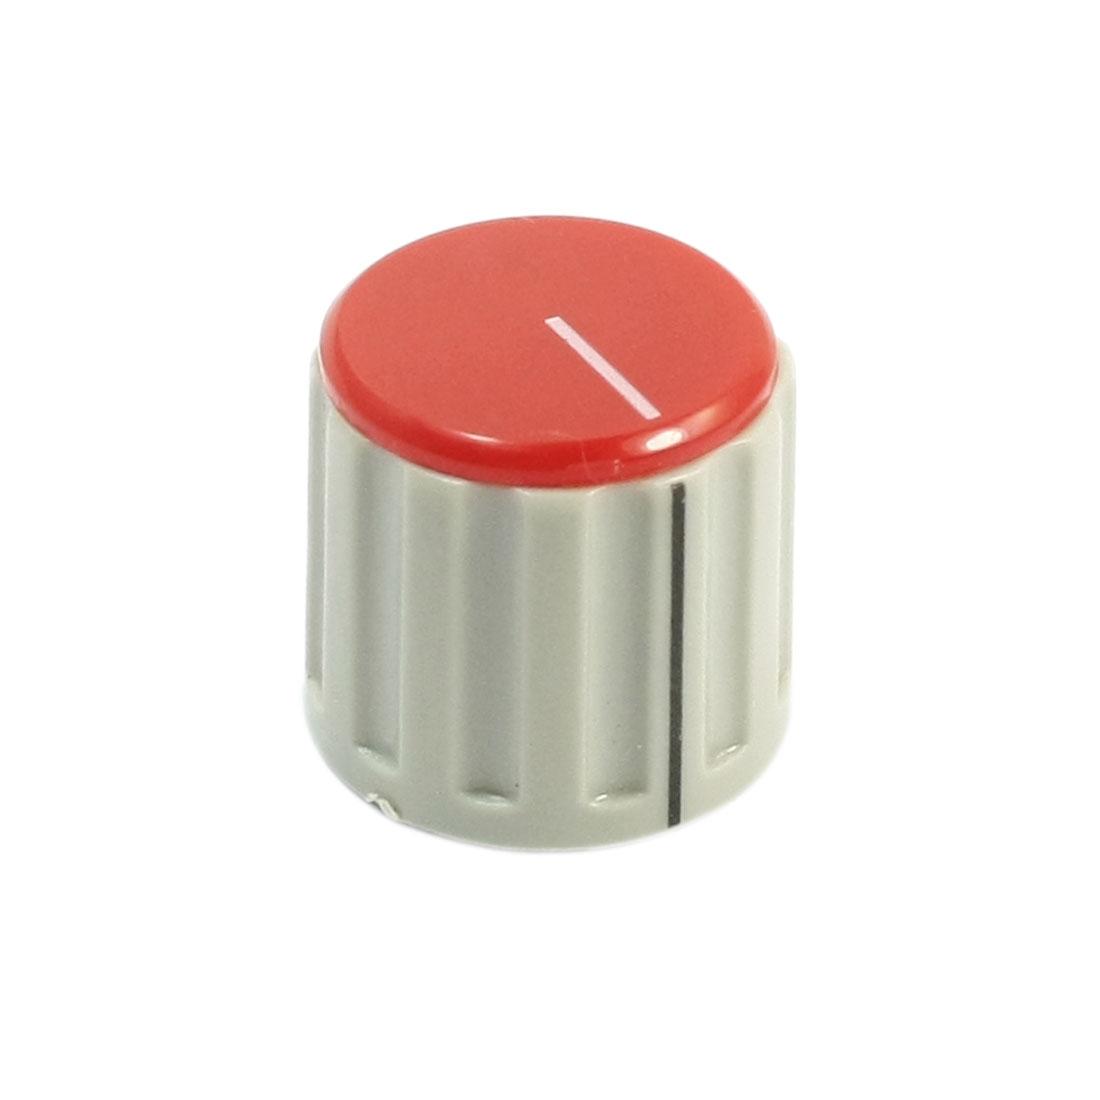 6mm Split Shaft Red Cap Stereo Radio Taper Potentiometer Volume Knob KN115